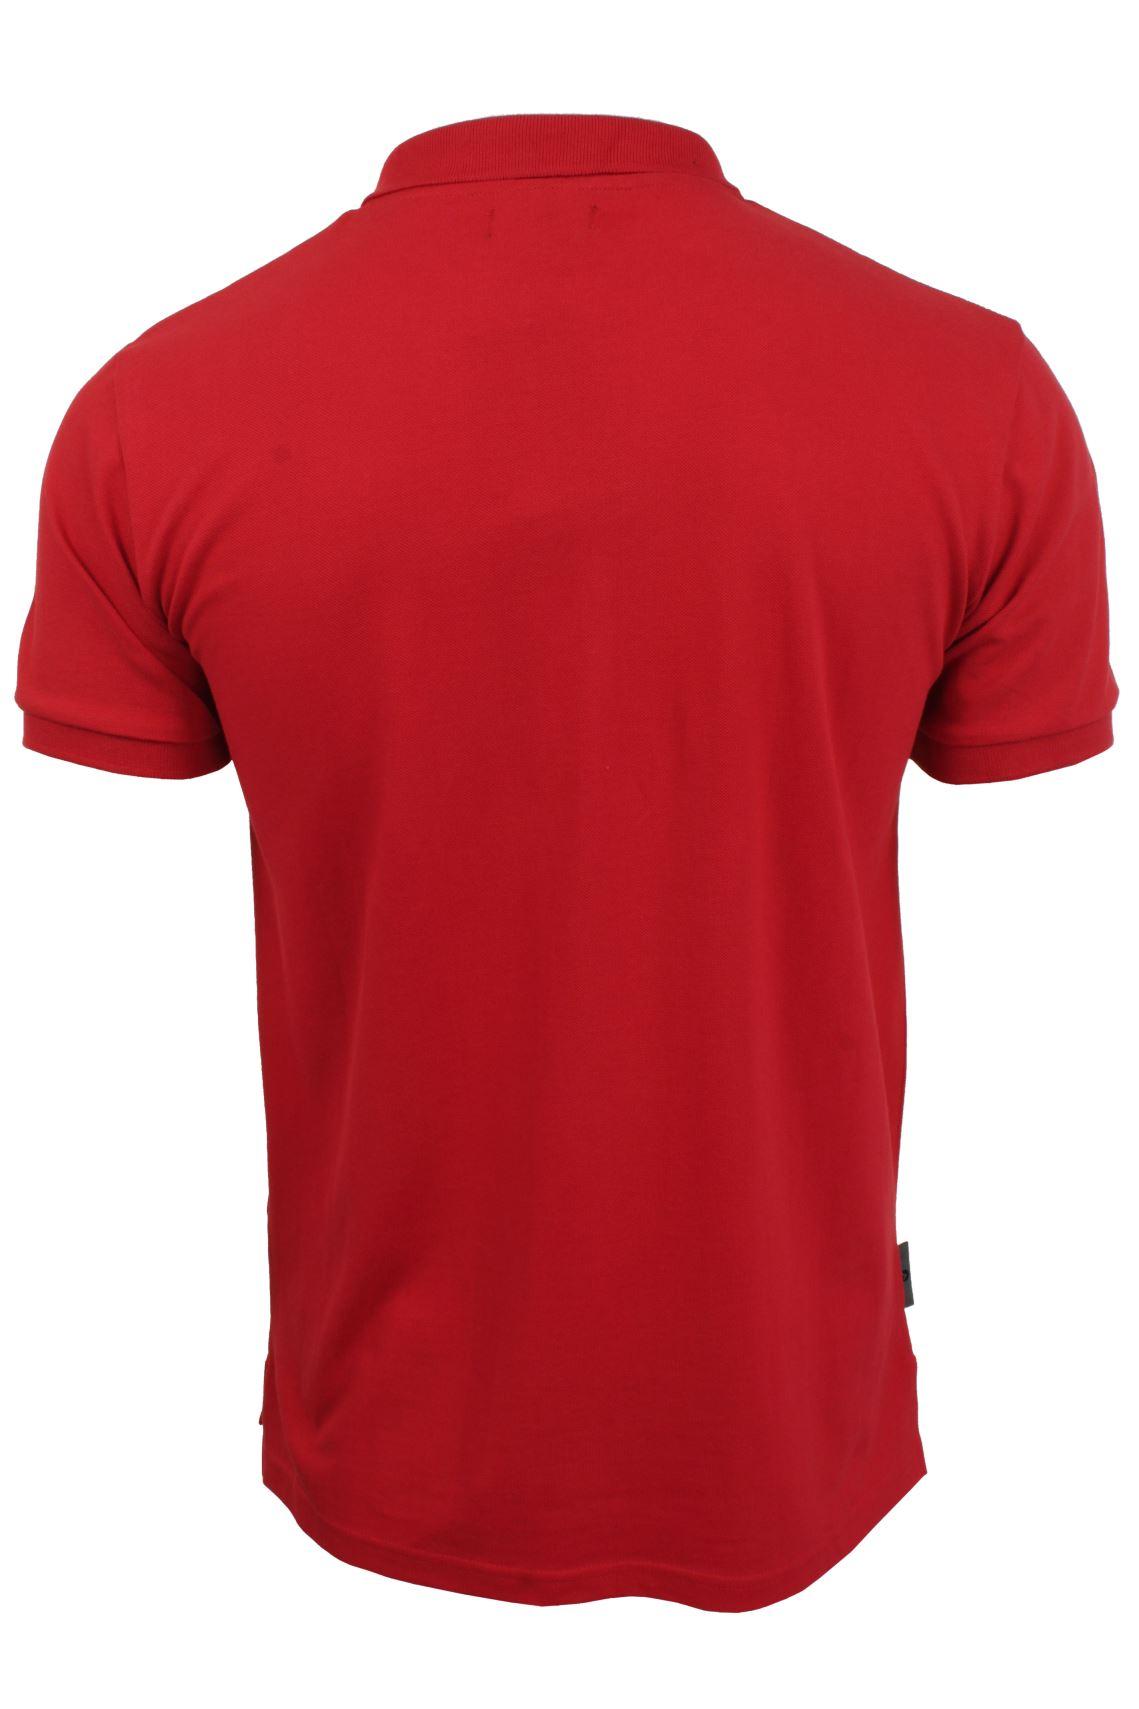 Camisa-Polo-para-hombre-Voi-Jeans-Redford-de-manga-corta-de-moda miniatura 8